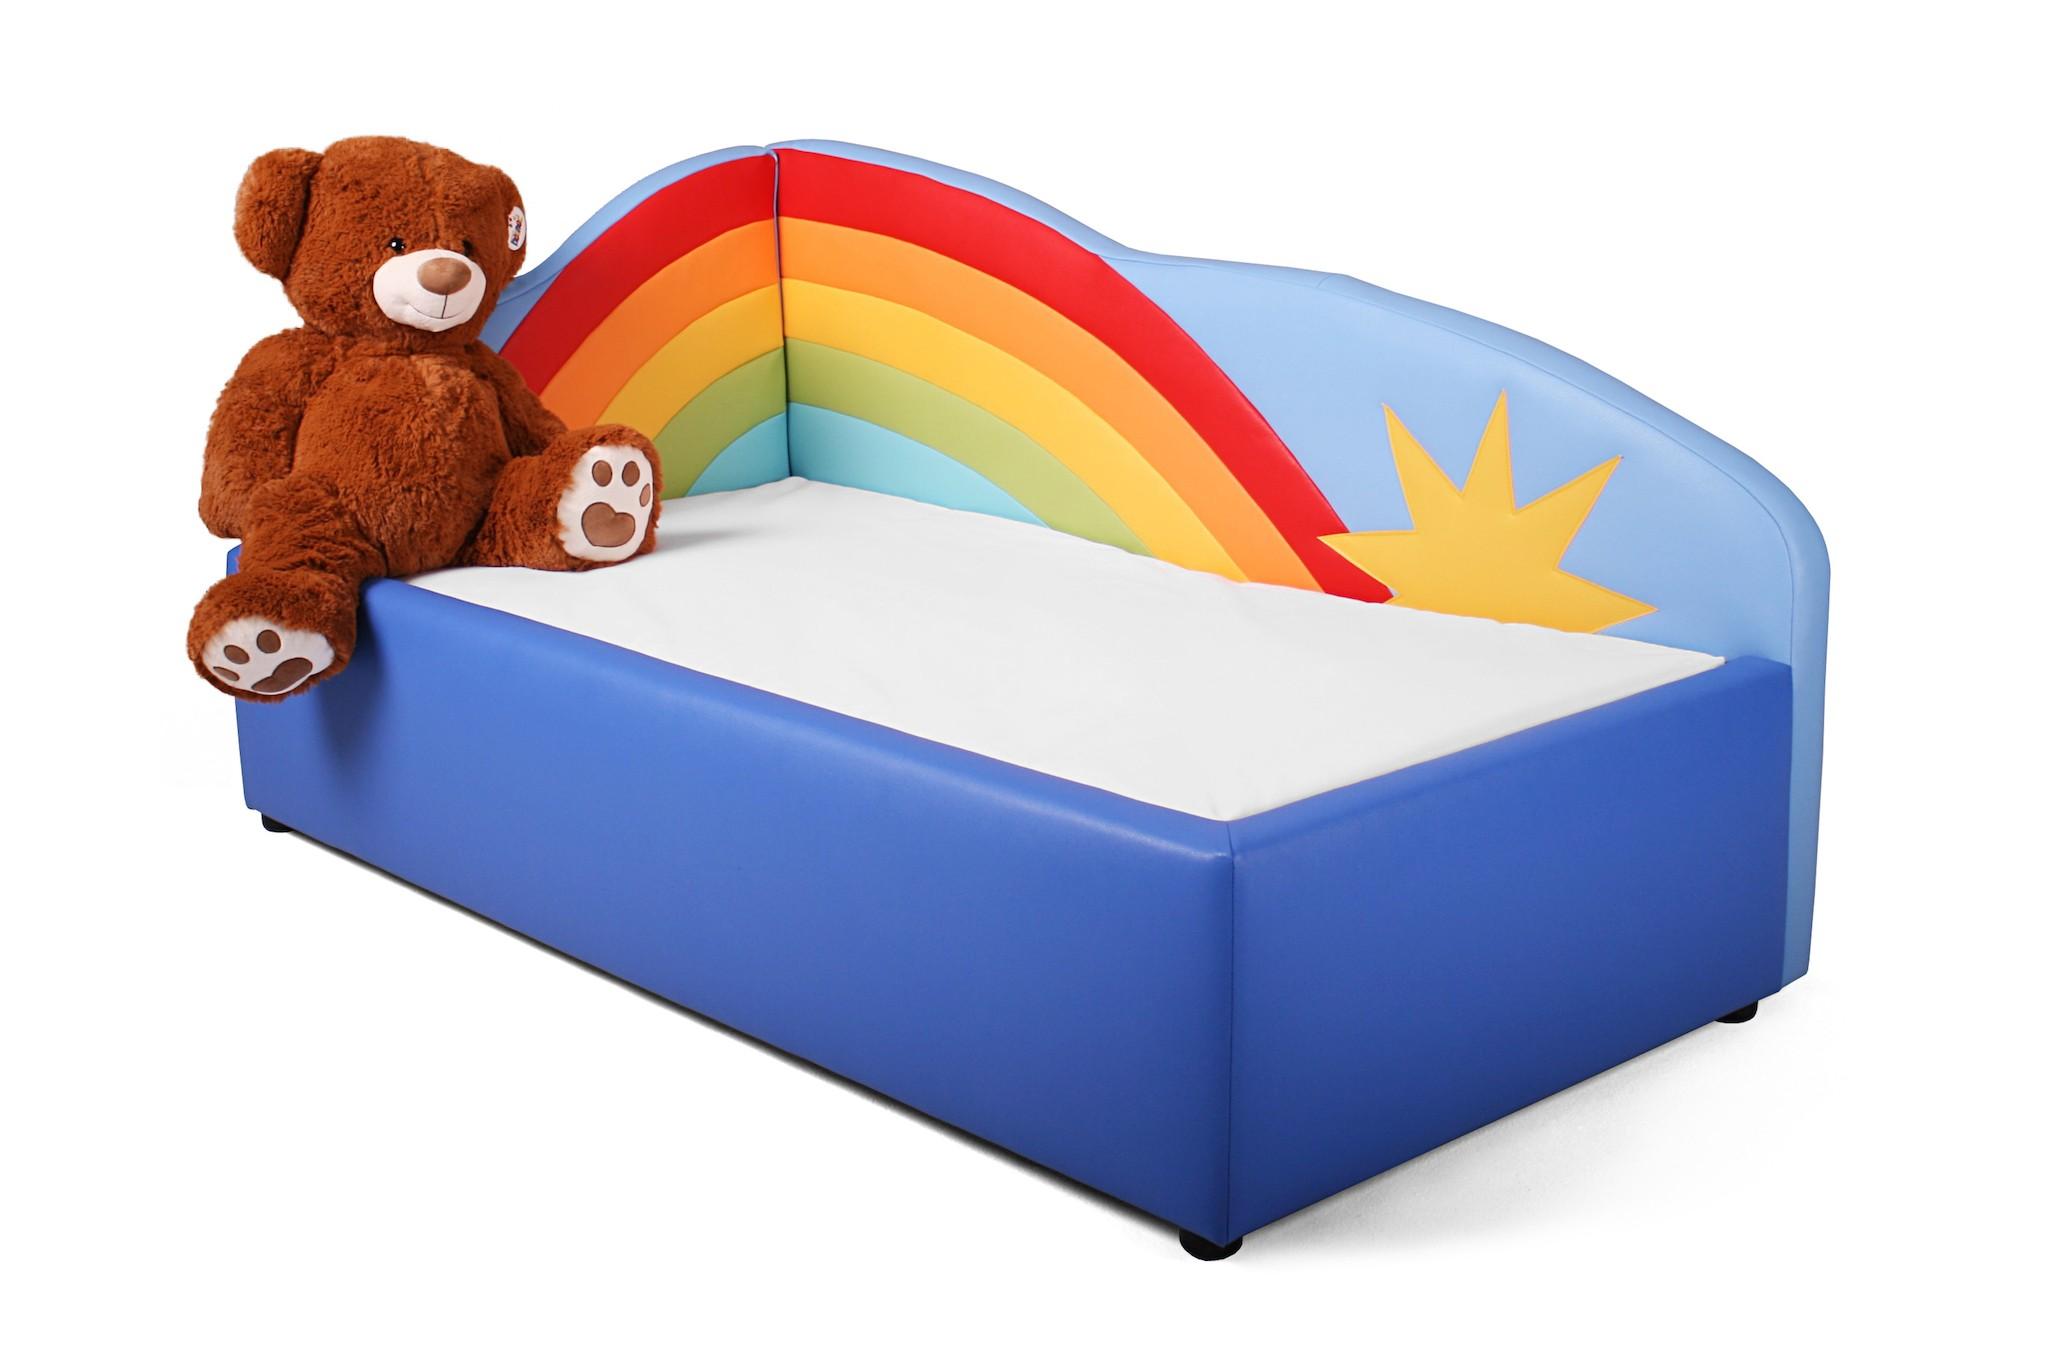 kinderbett tomto motiv regenbogen inkl matratze und lattenrost kinderzimmer m bel kinderbett. Black Bedroom Furniture Sets. Home Design Ideas